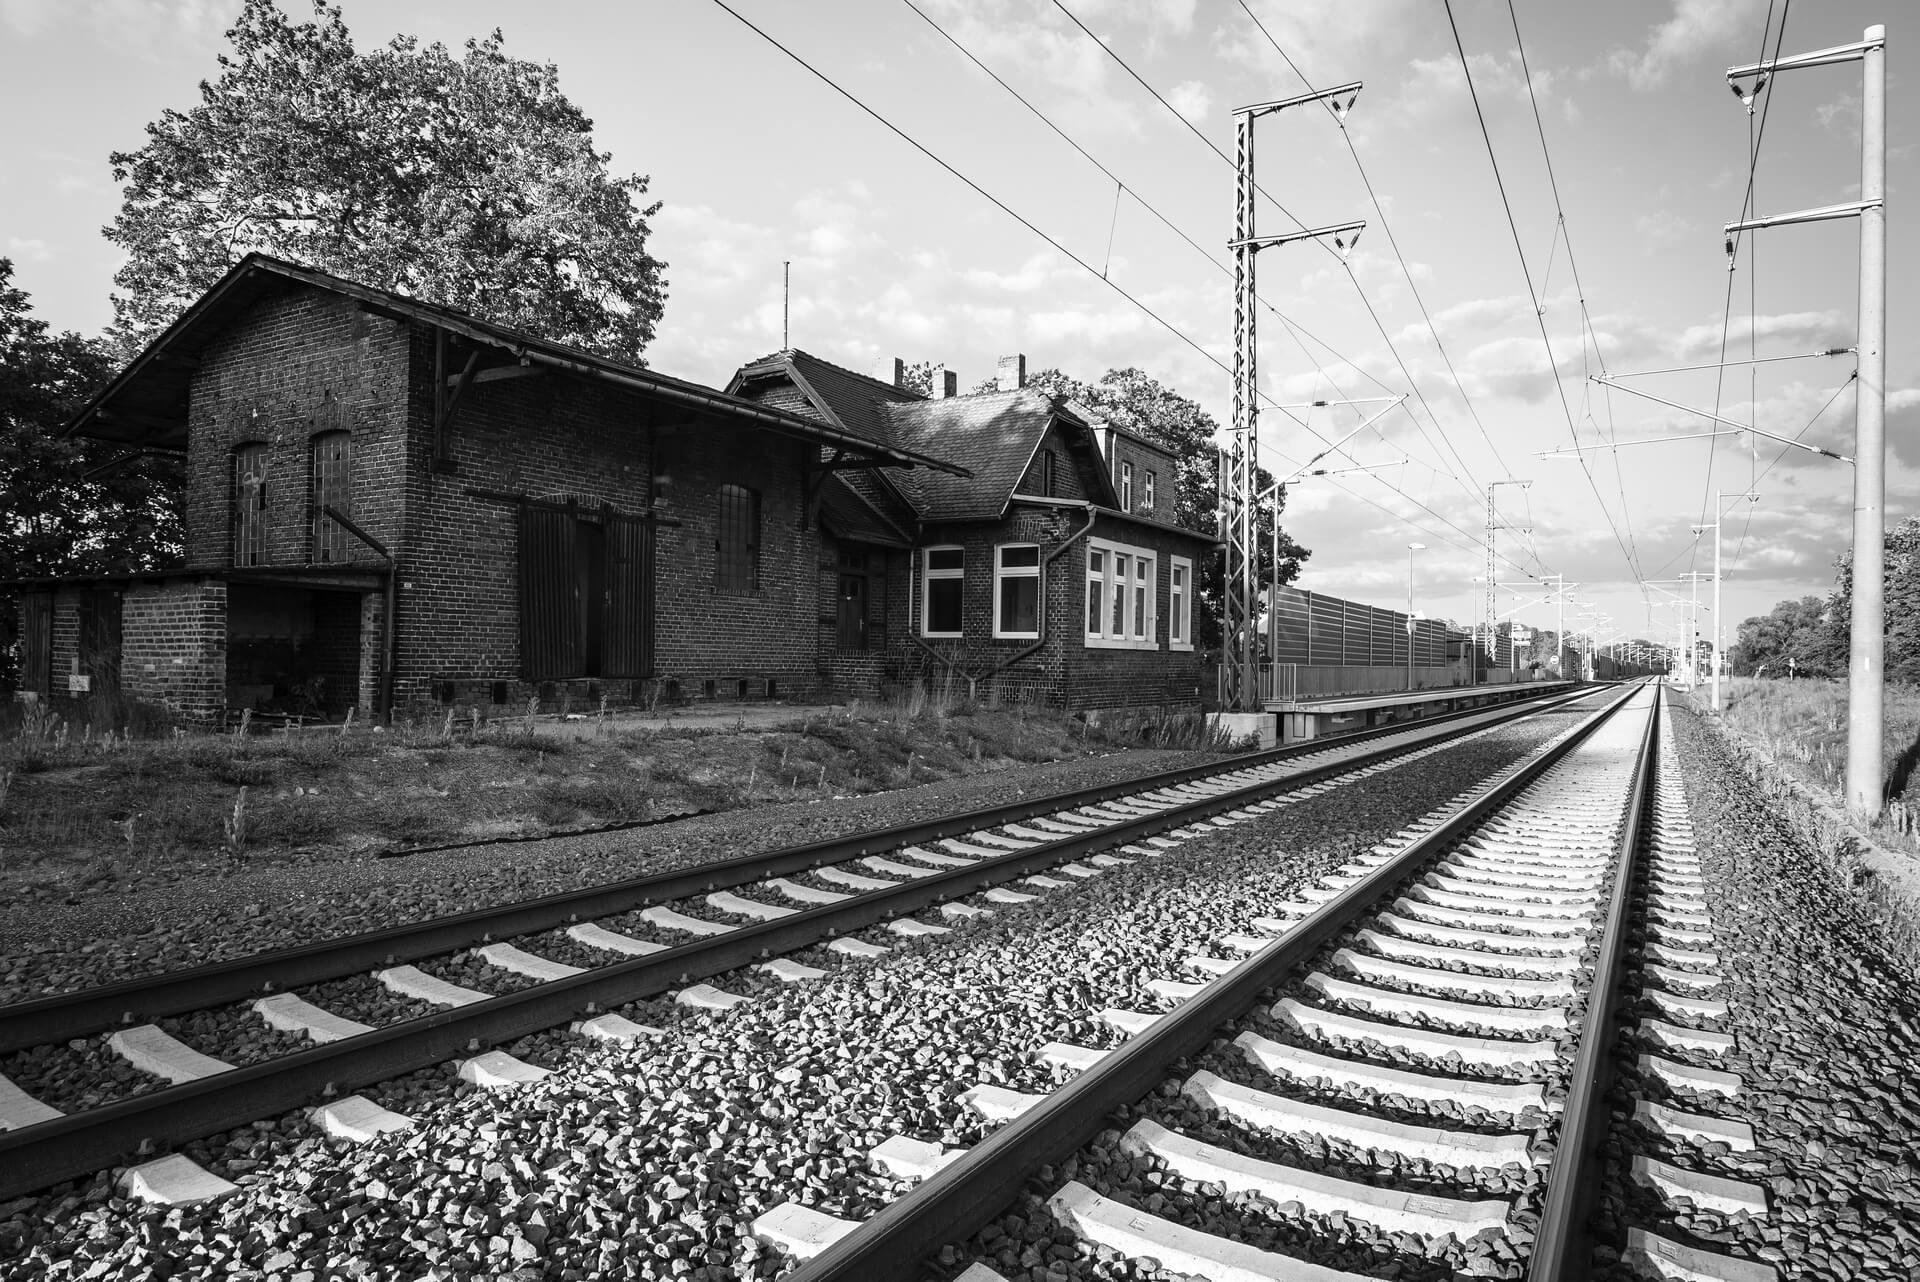 Klitten, Bahnhof